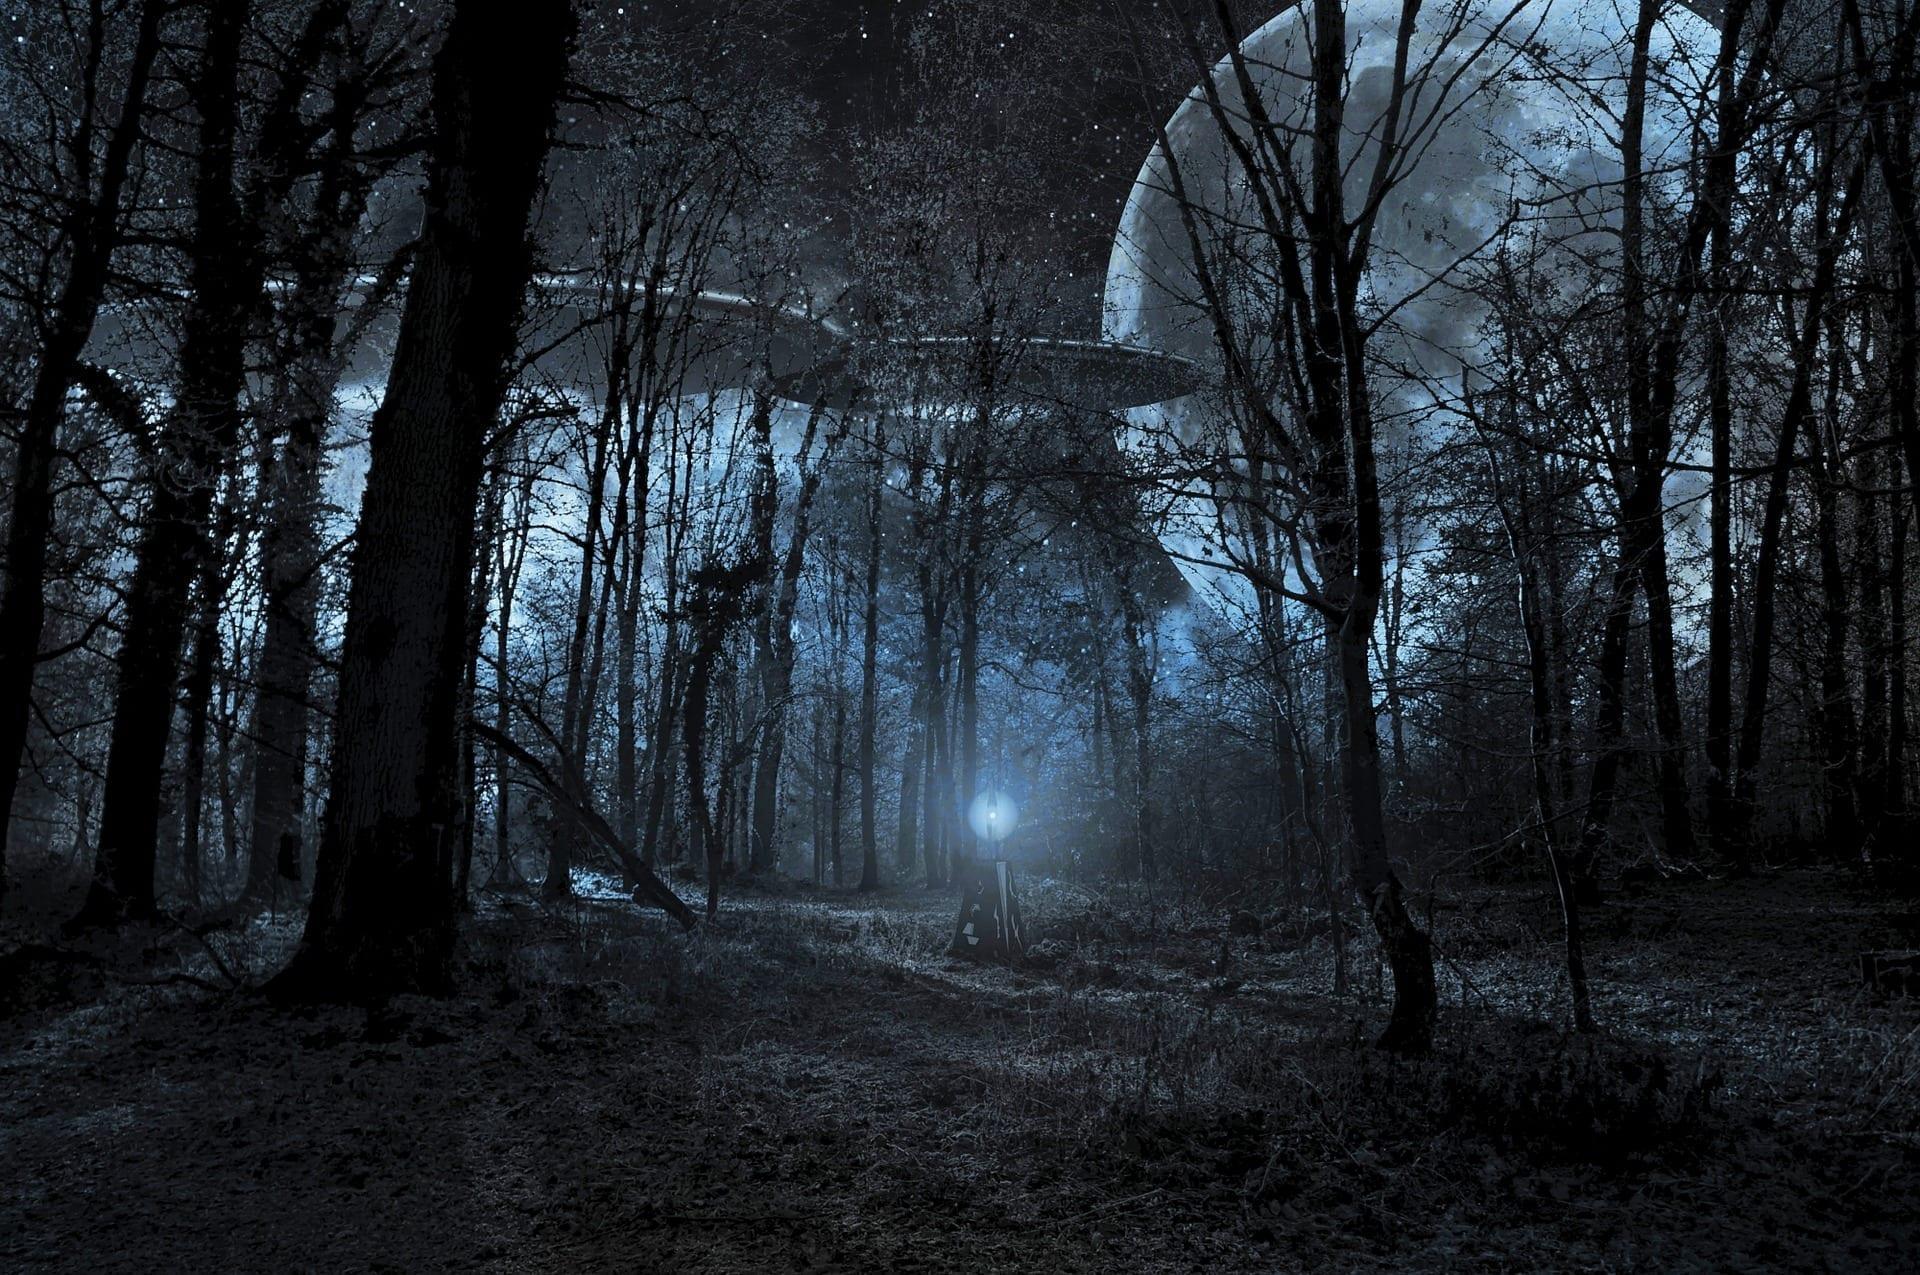 UFO? by moonlight through tree shadows